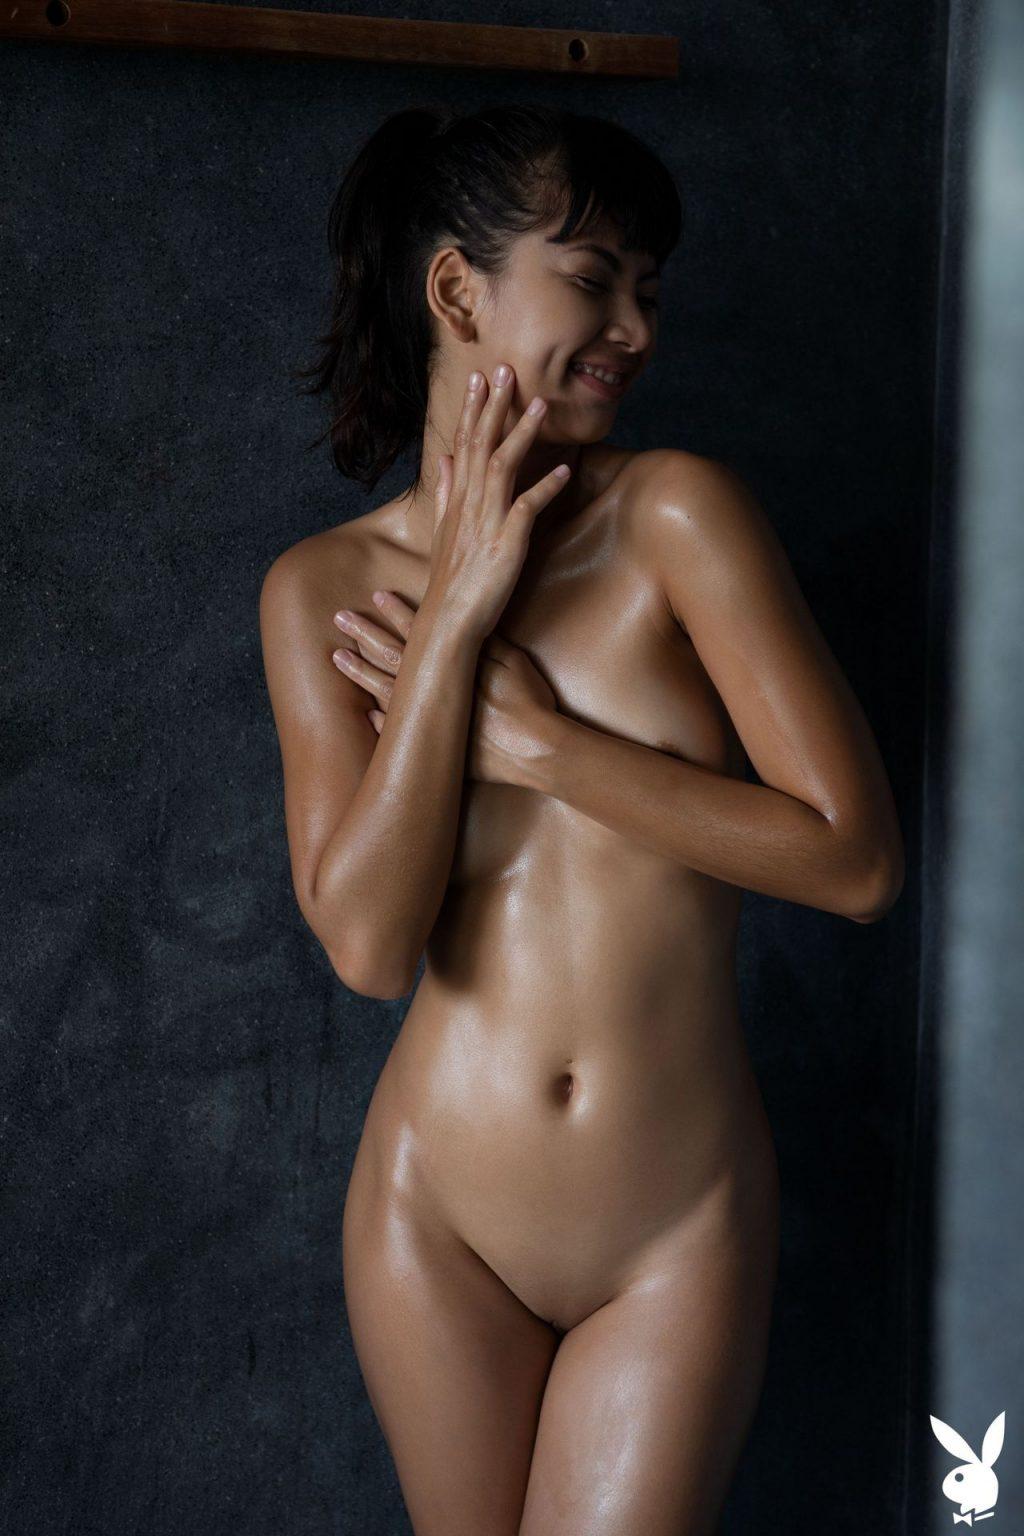 Cara Pin Nude – Soft Shower (39 Photos + GIFs & Video)